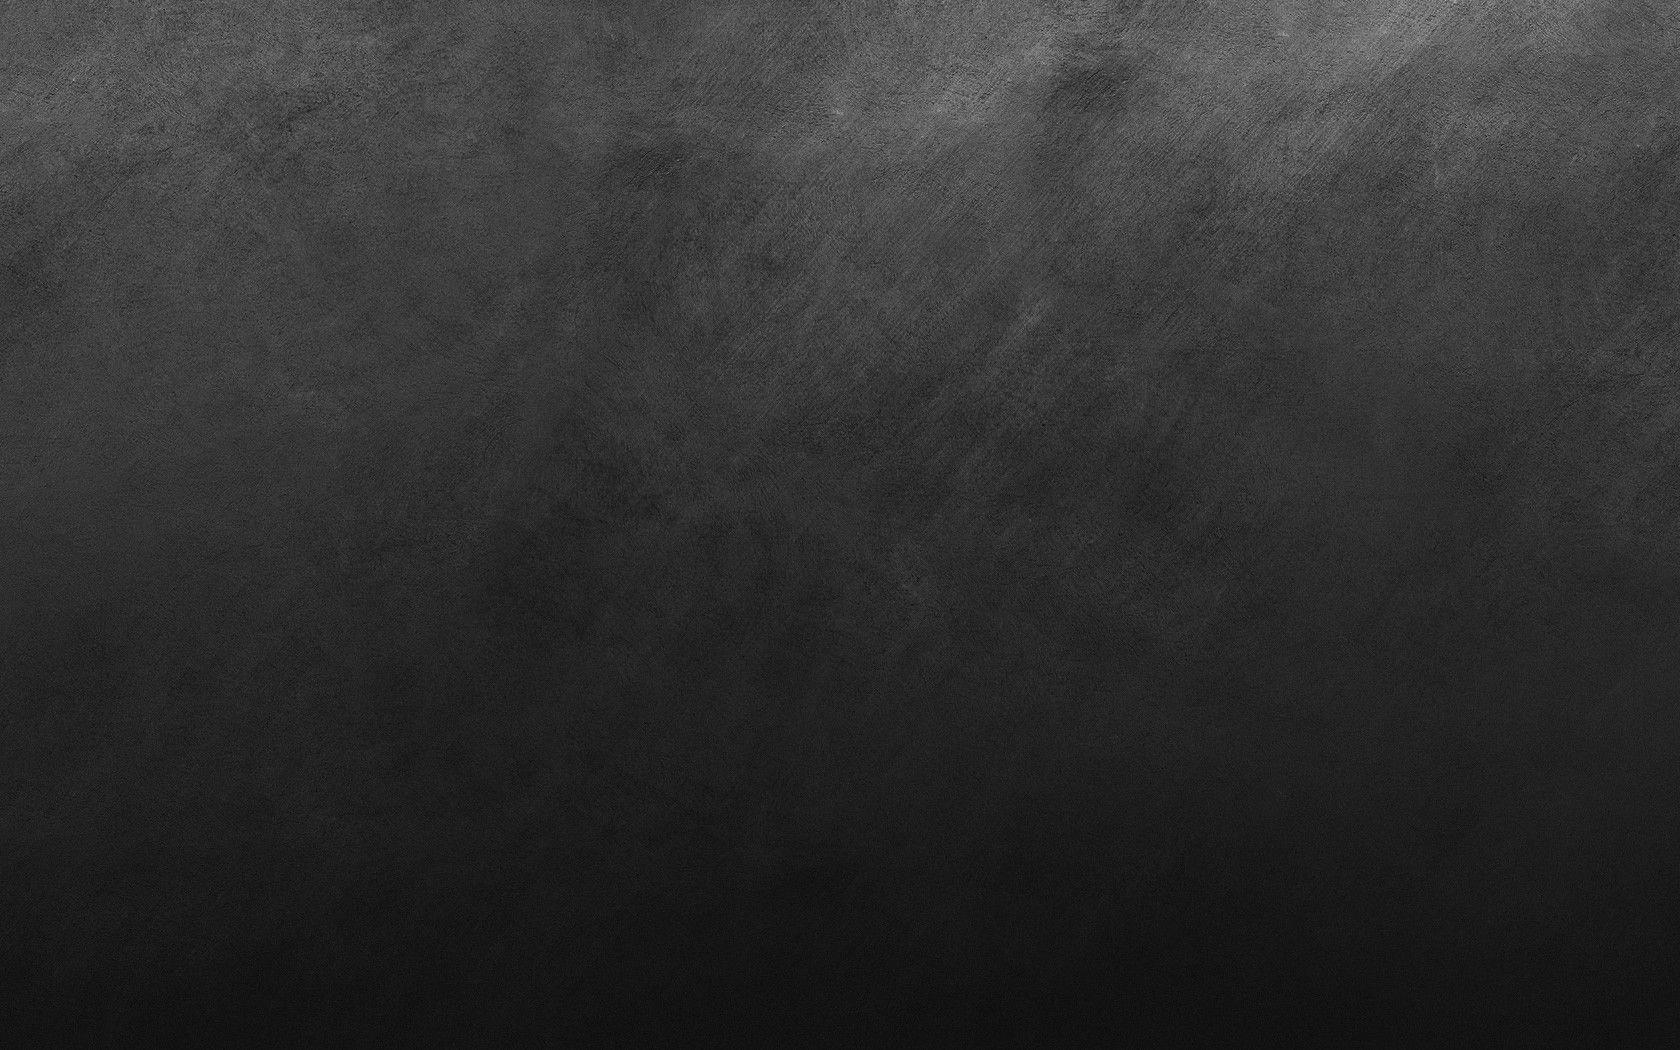 black texture wallpaper hd - photo #17